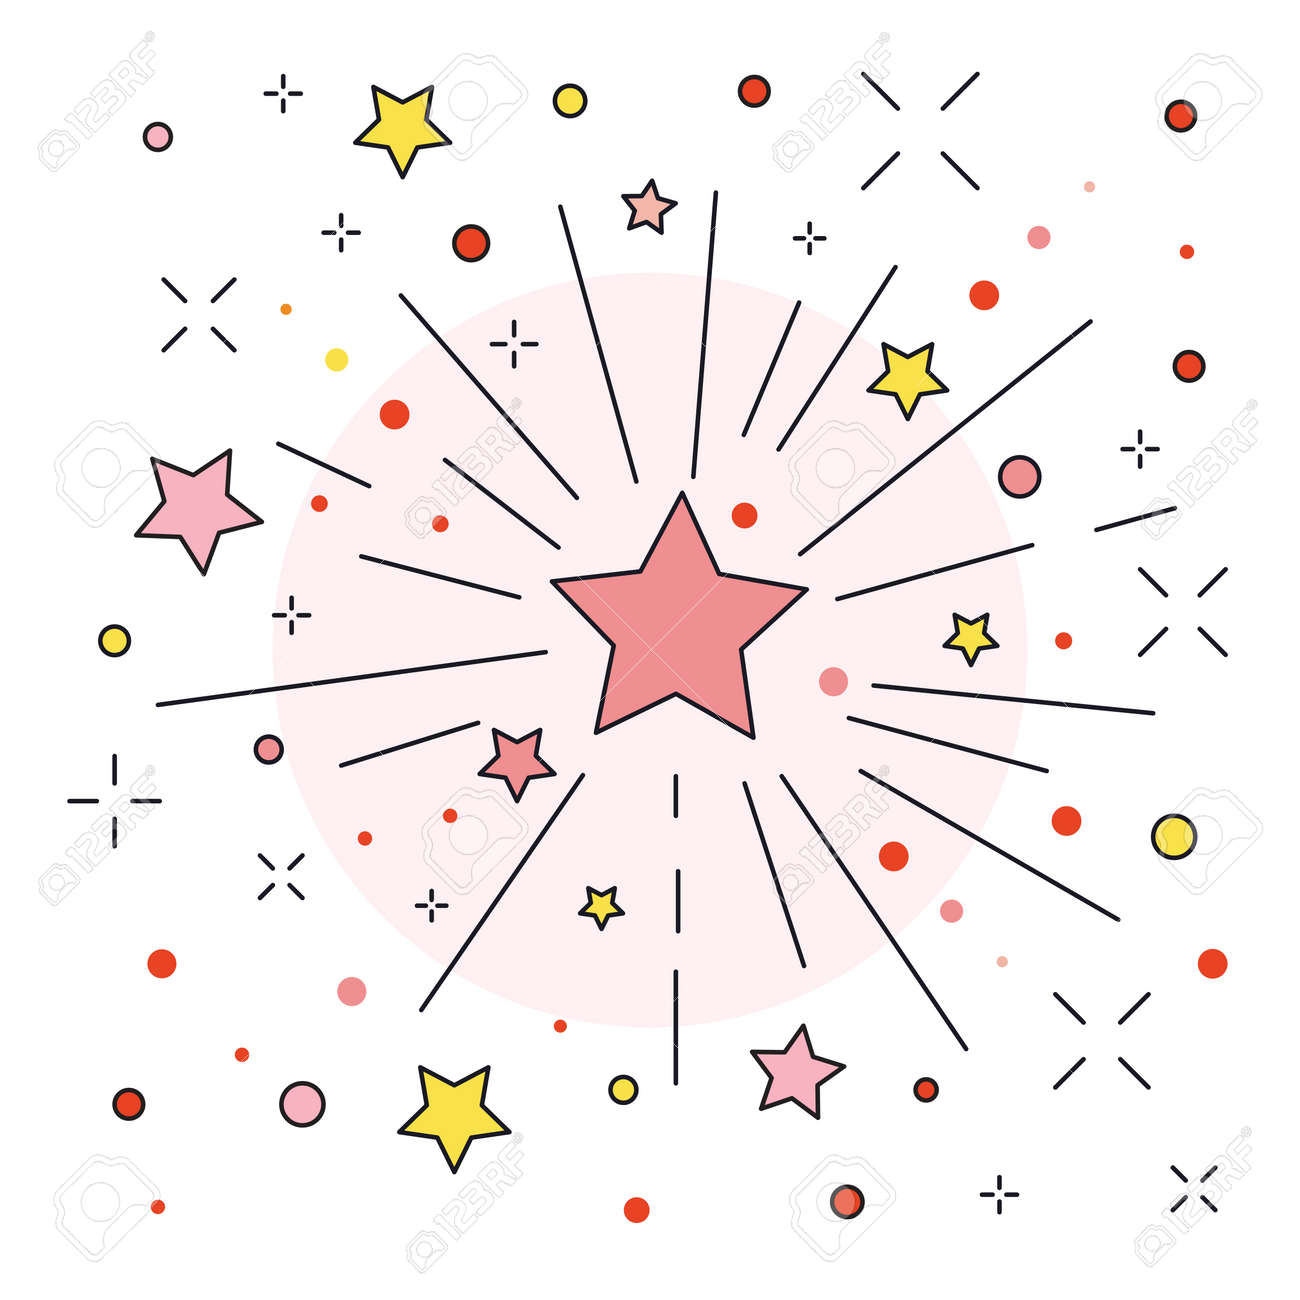 Festive Firework or Firecracker Icon in line Art - 157982598